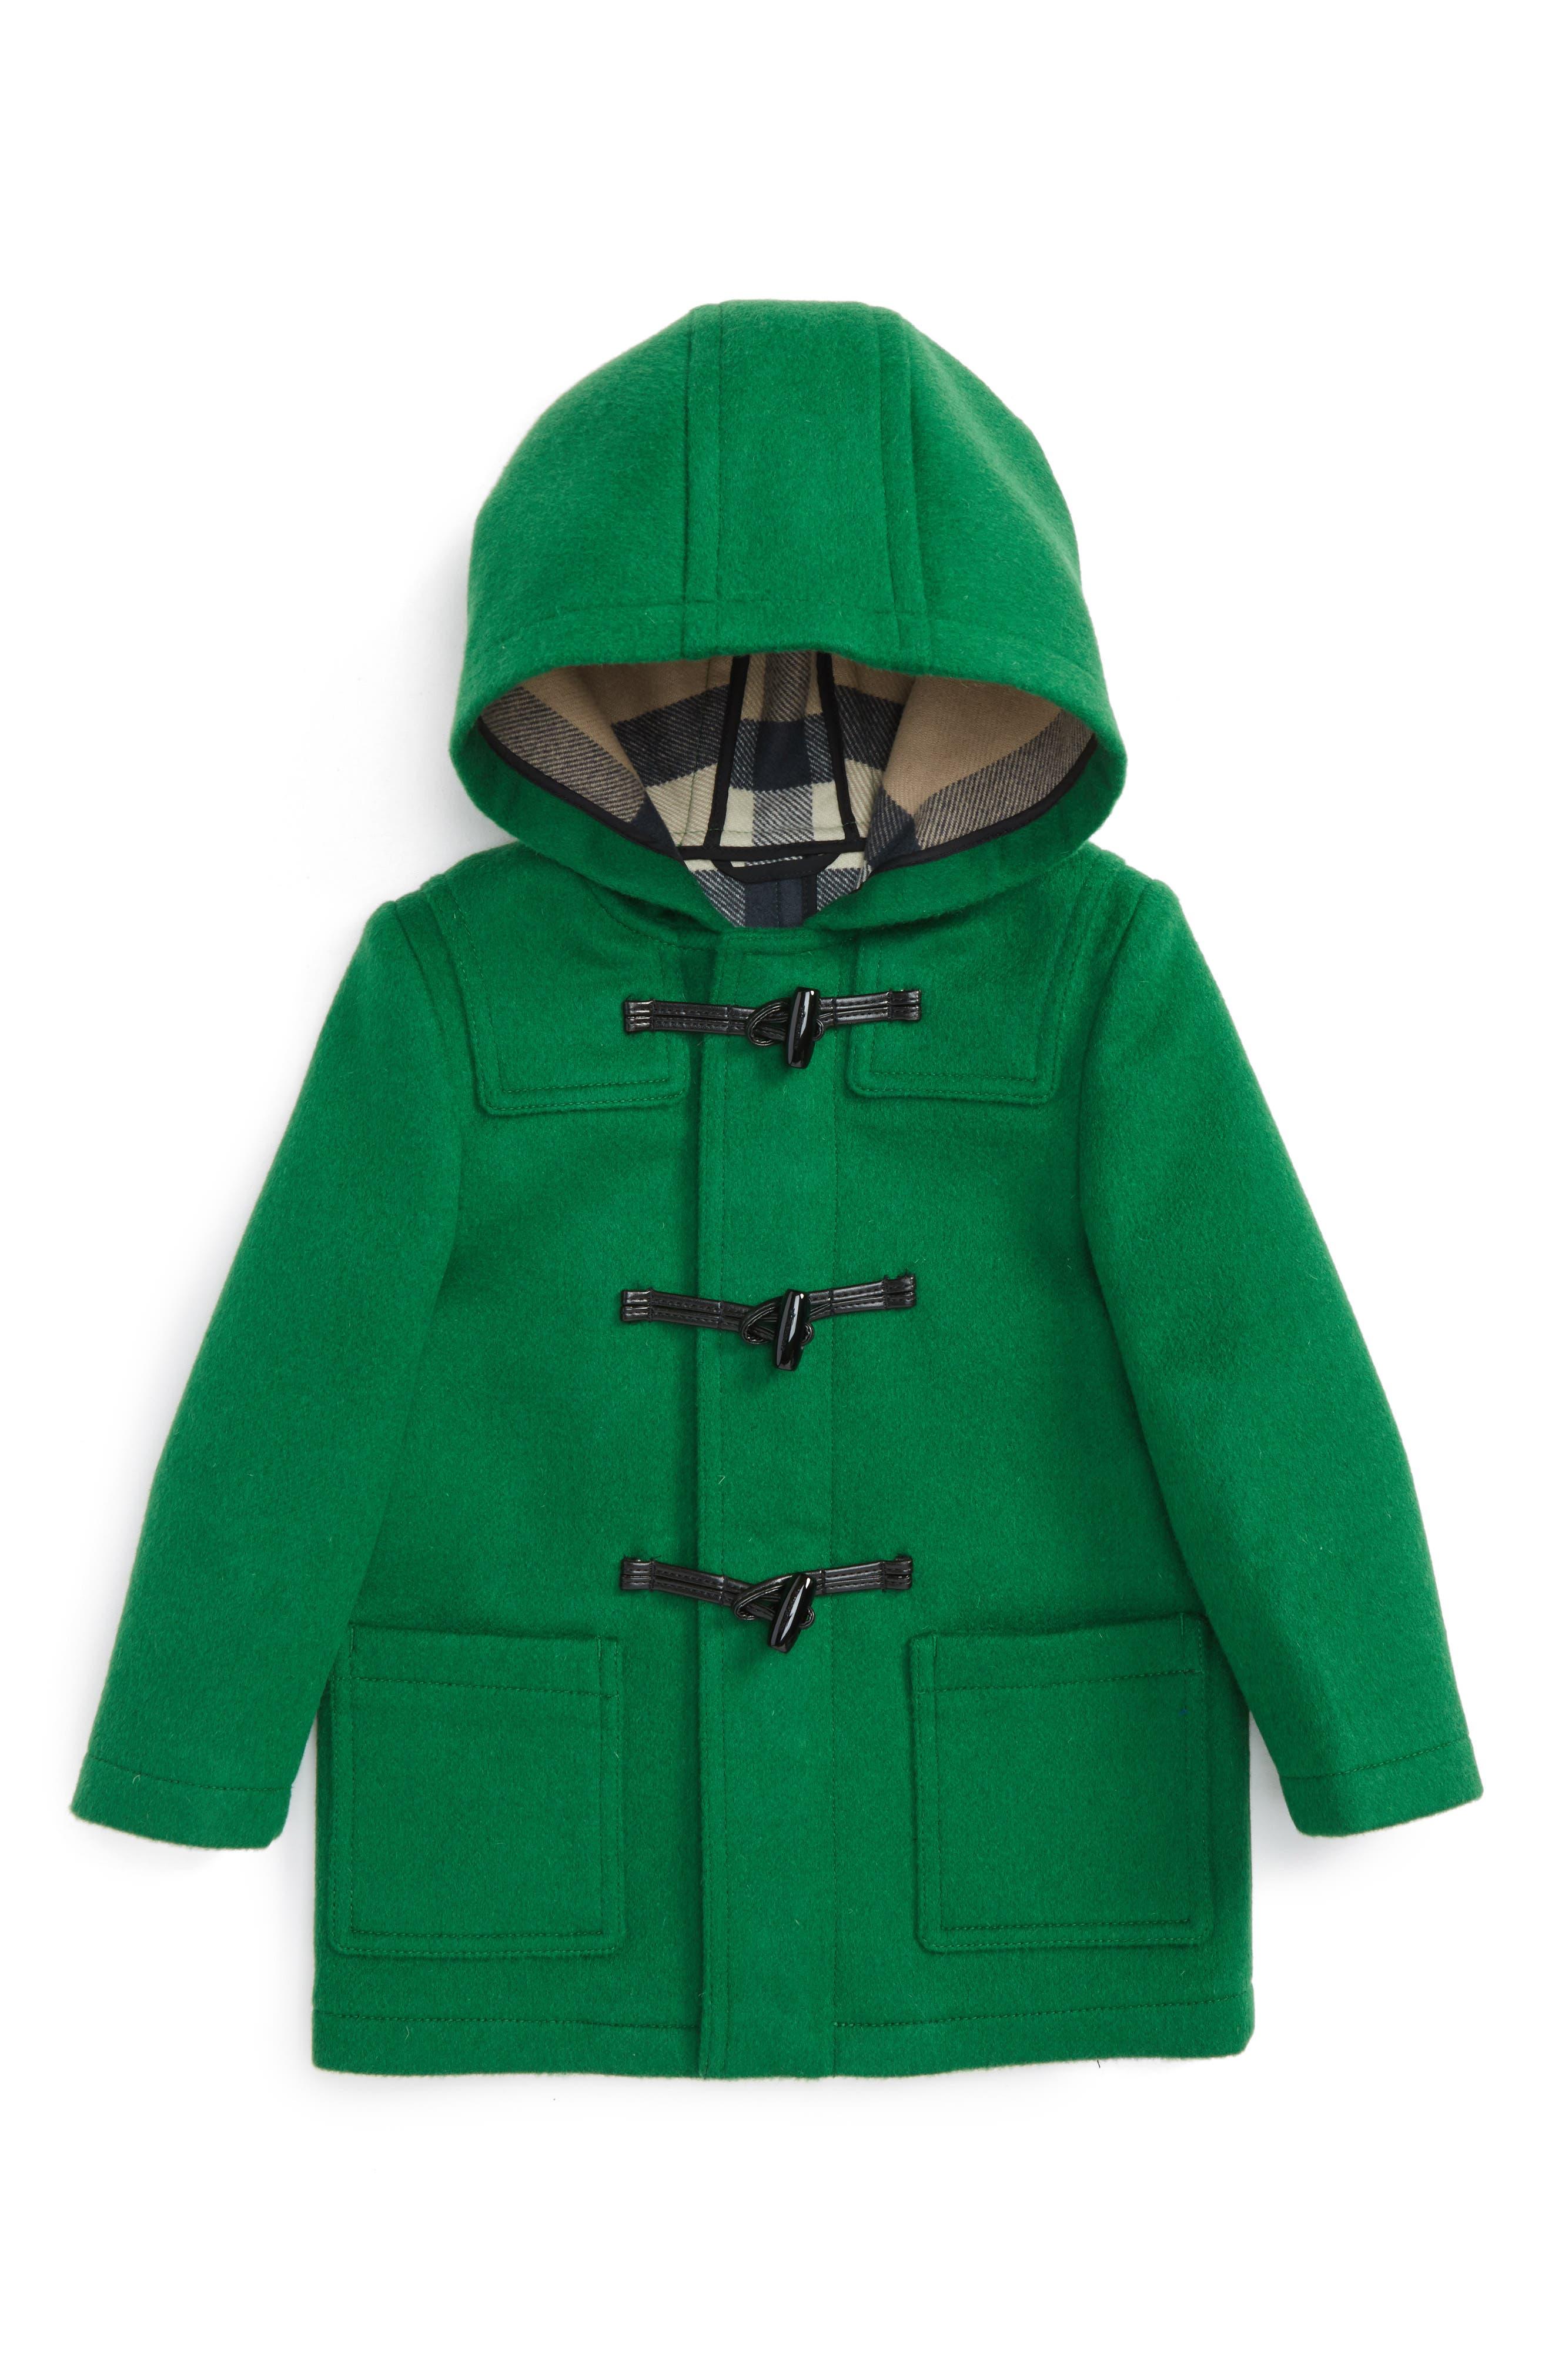 Burberry Brogan Hooded Wool Jacket (Toddler Boys)